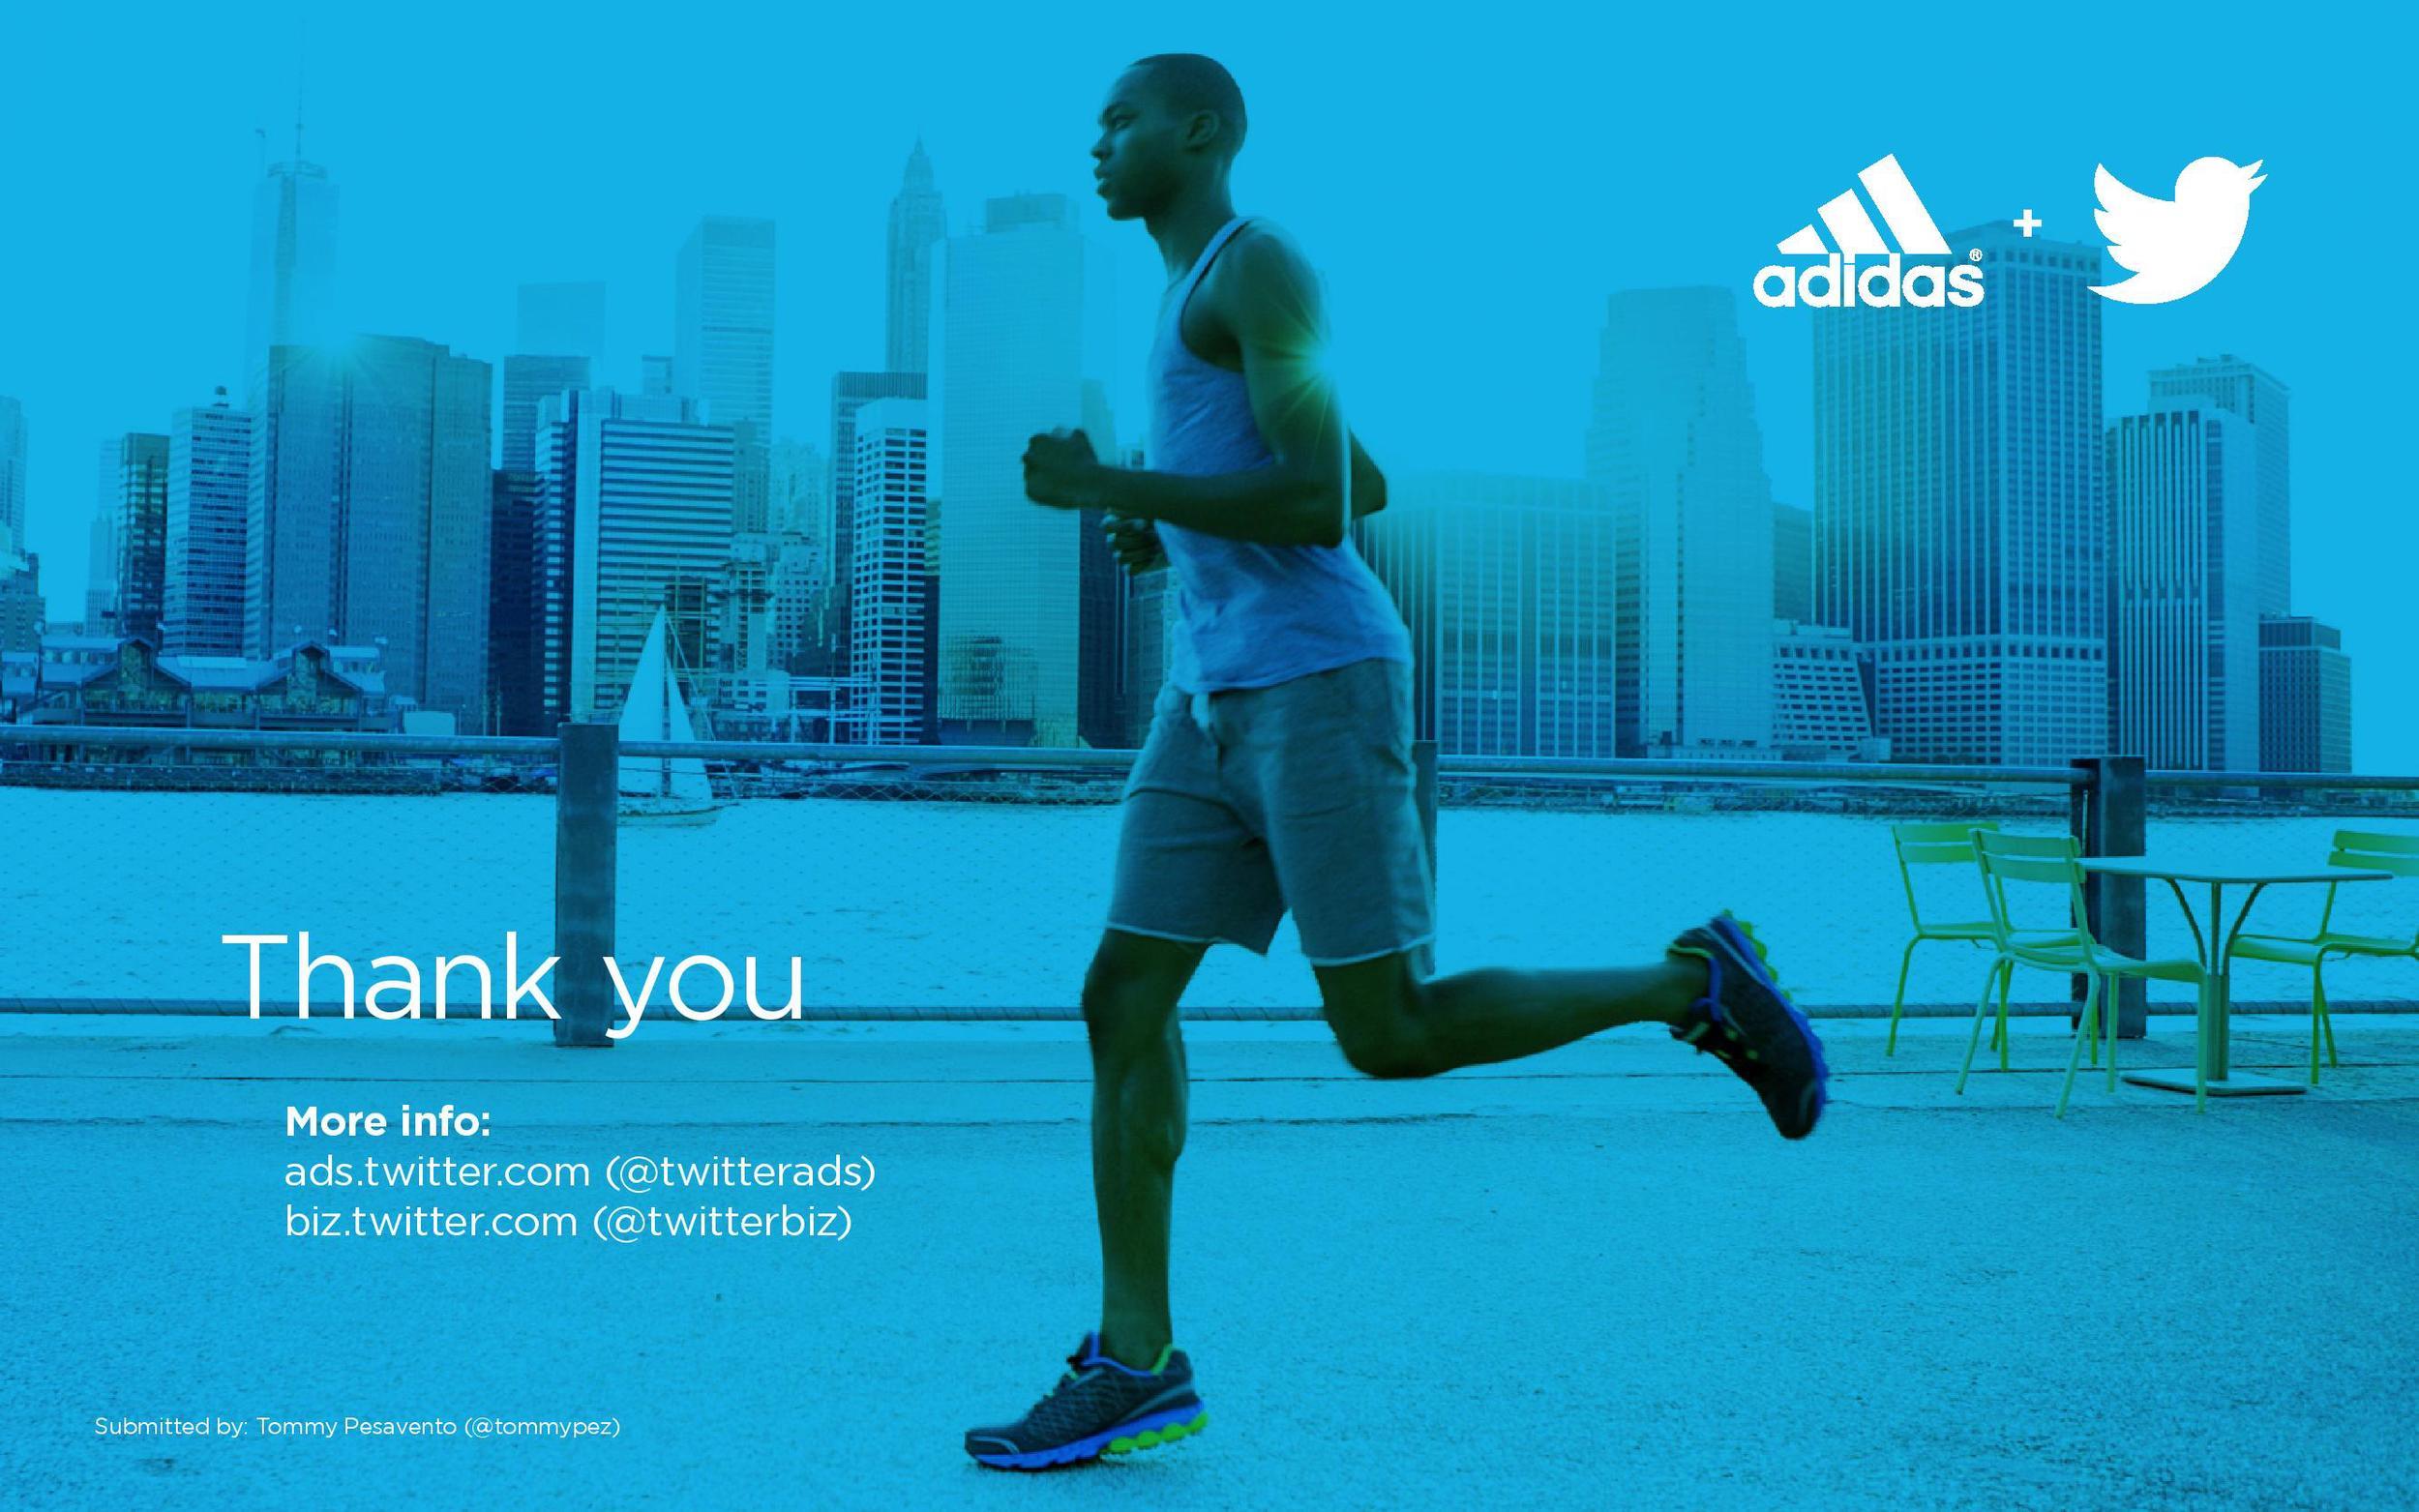 Adidas_Boost_Presentation_TP_Supp-page-015.jpg